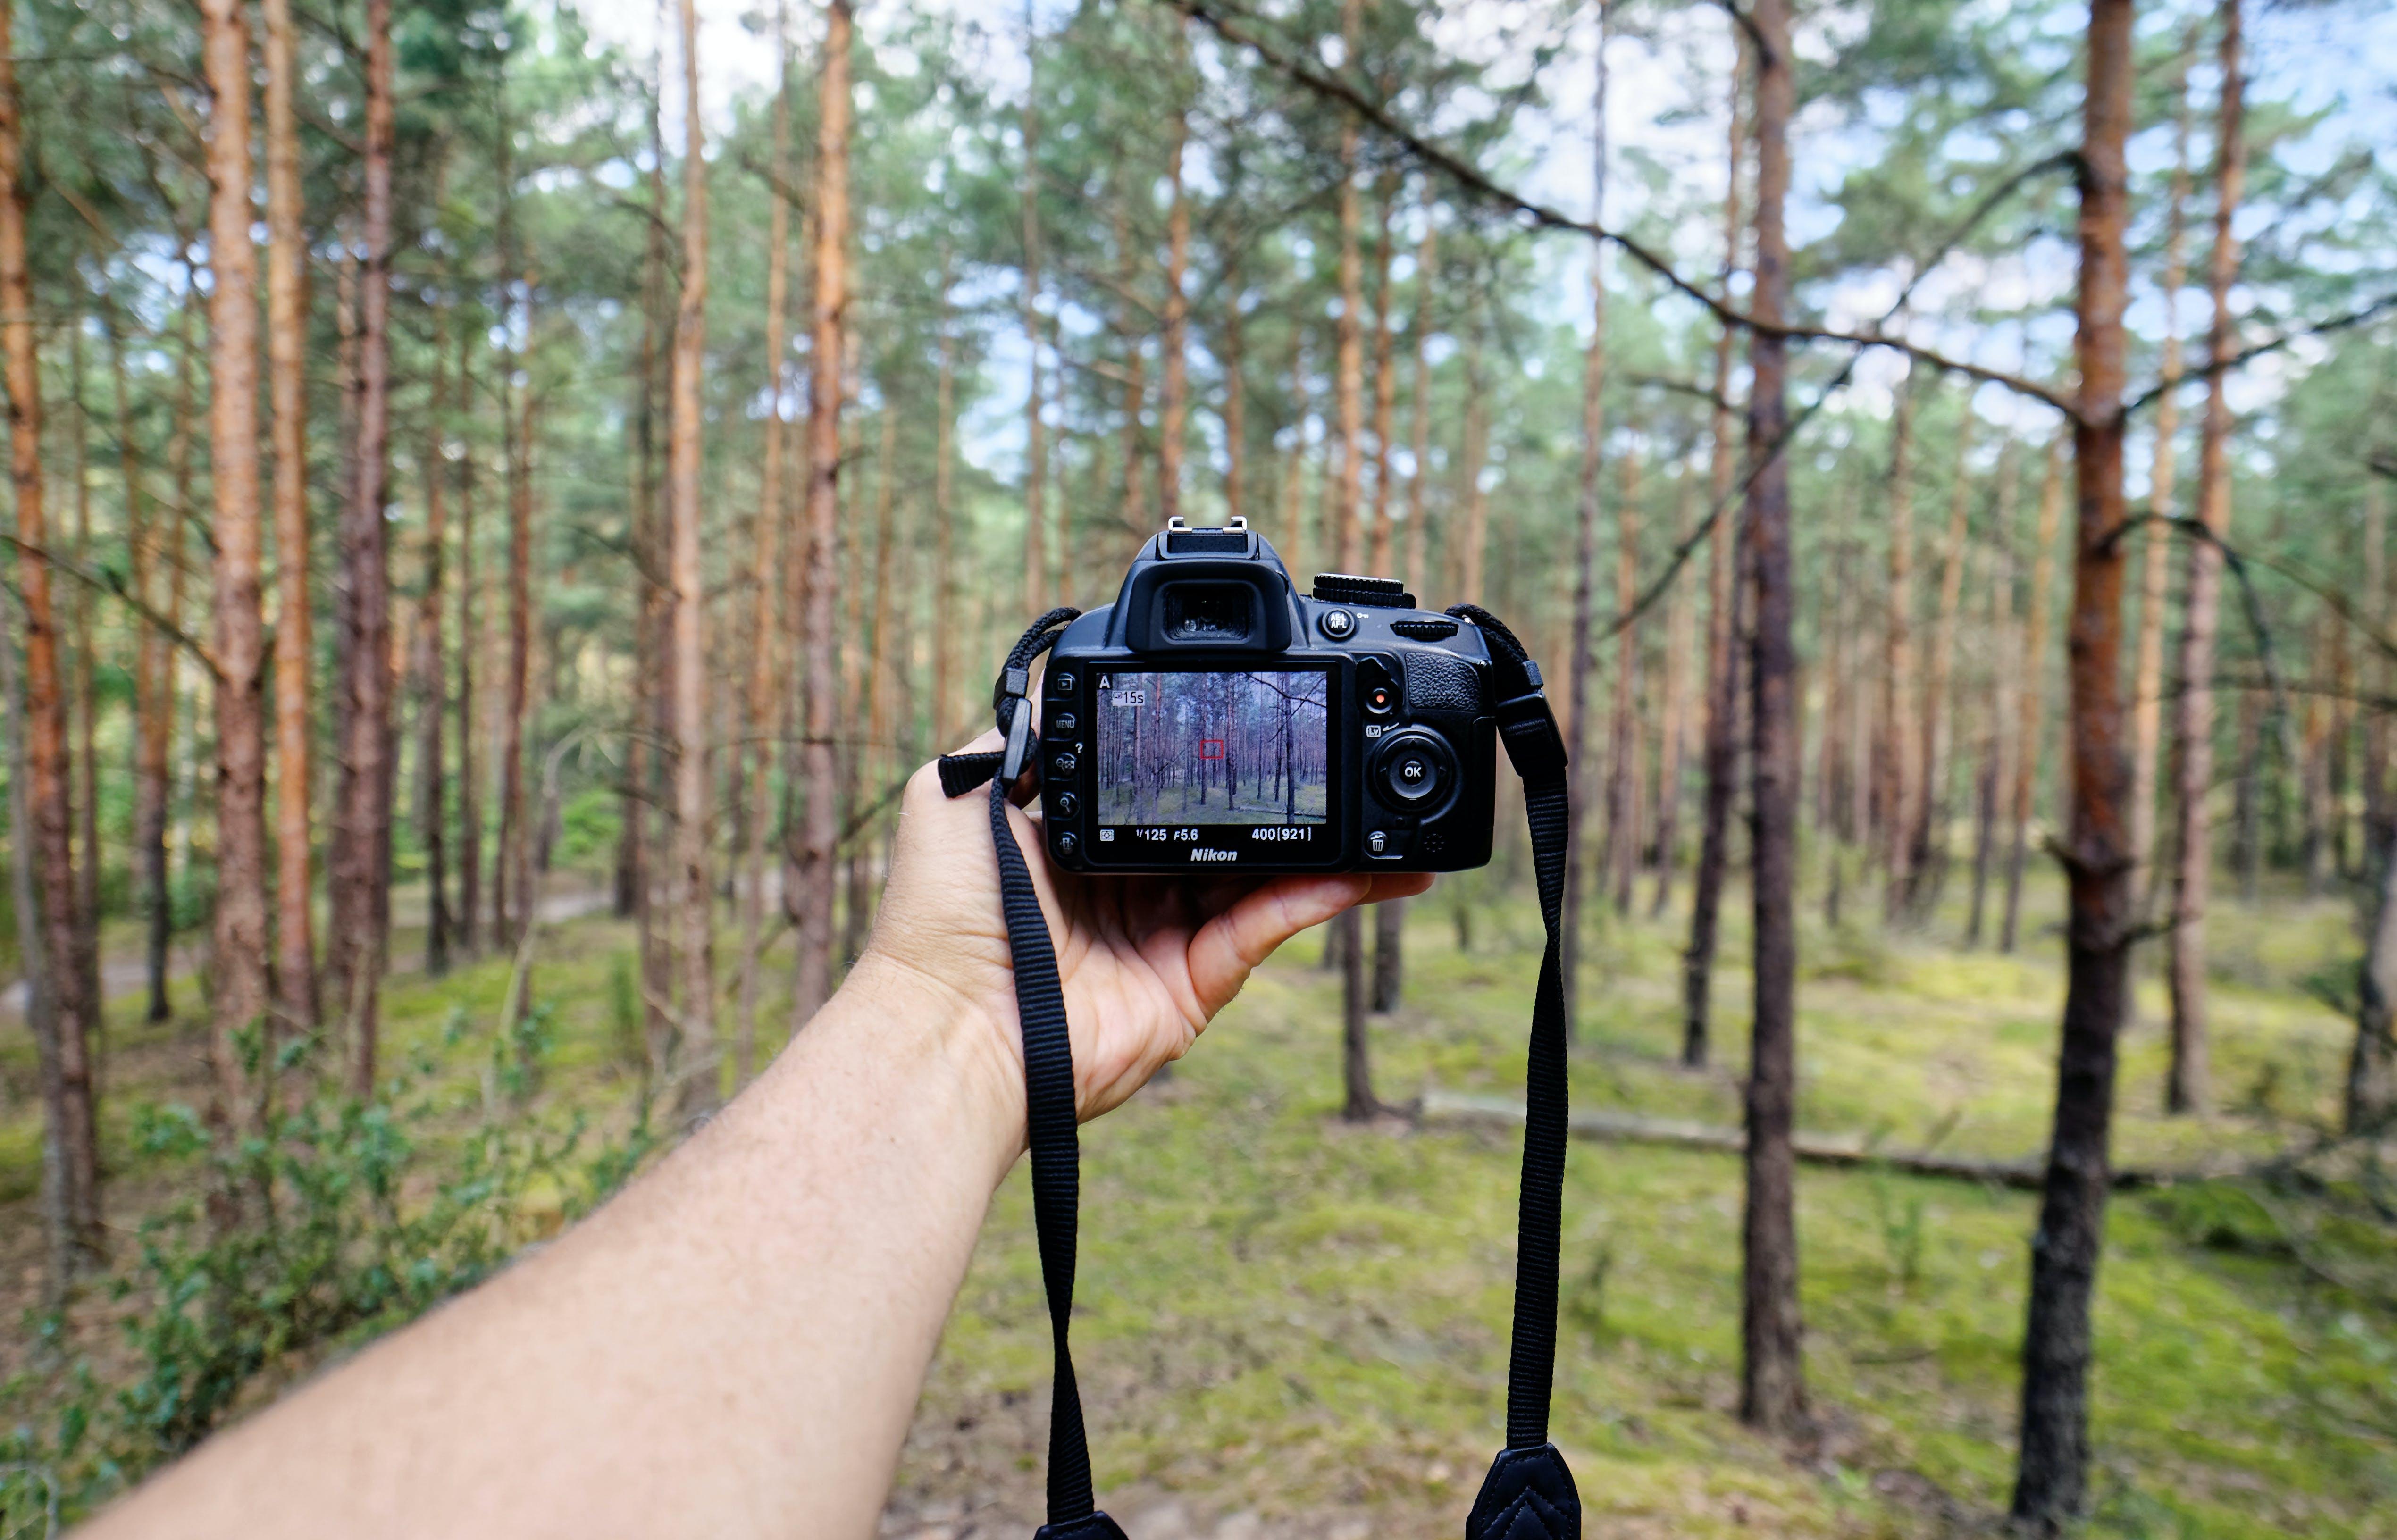 blur, digital camera, display